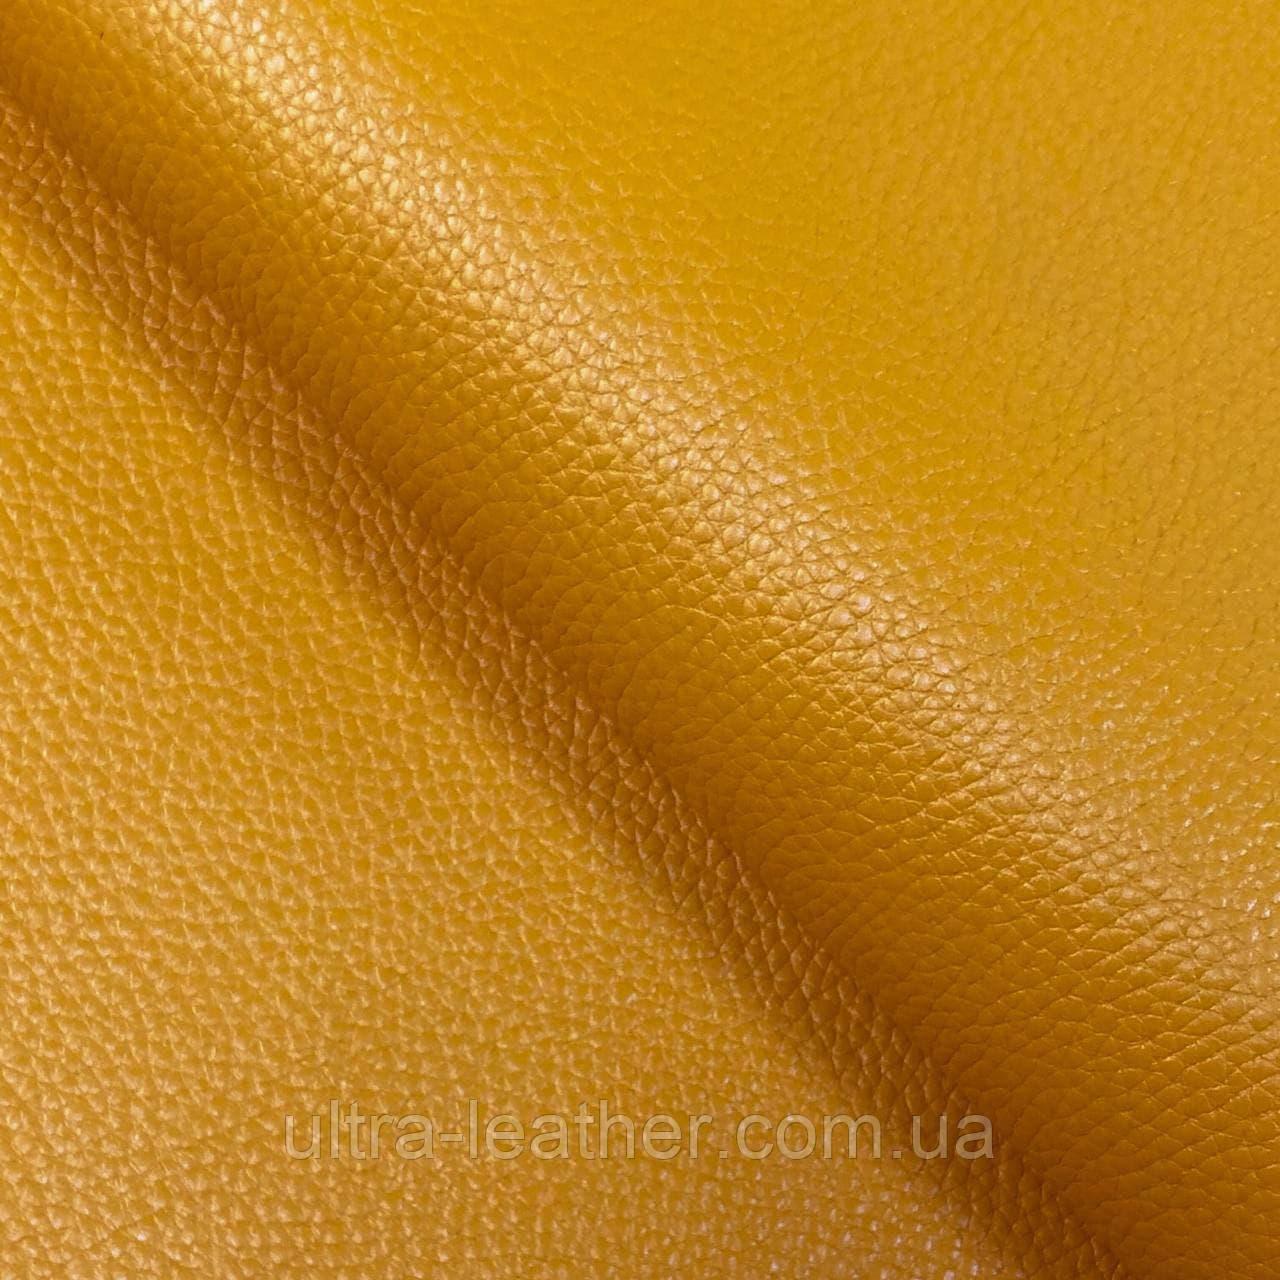 Натуральная галантерейная кожа  ФЛЕШ, Манго, Pantone 15-1049